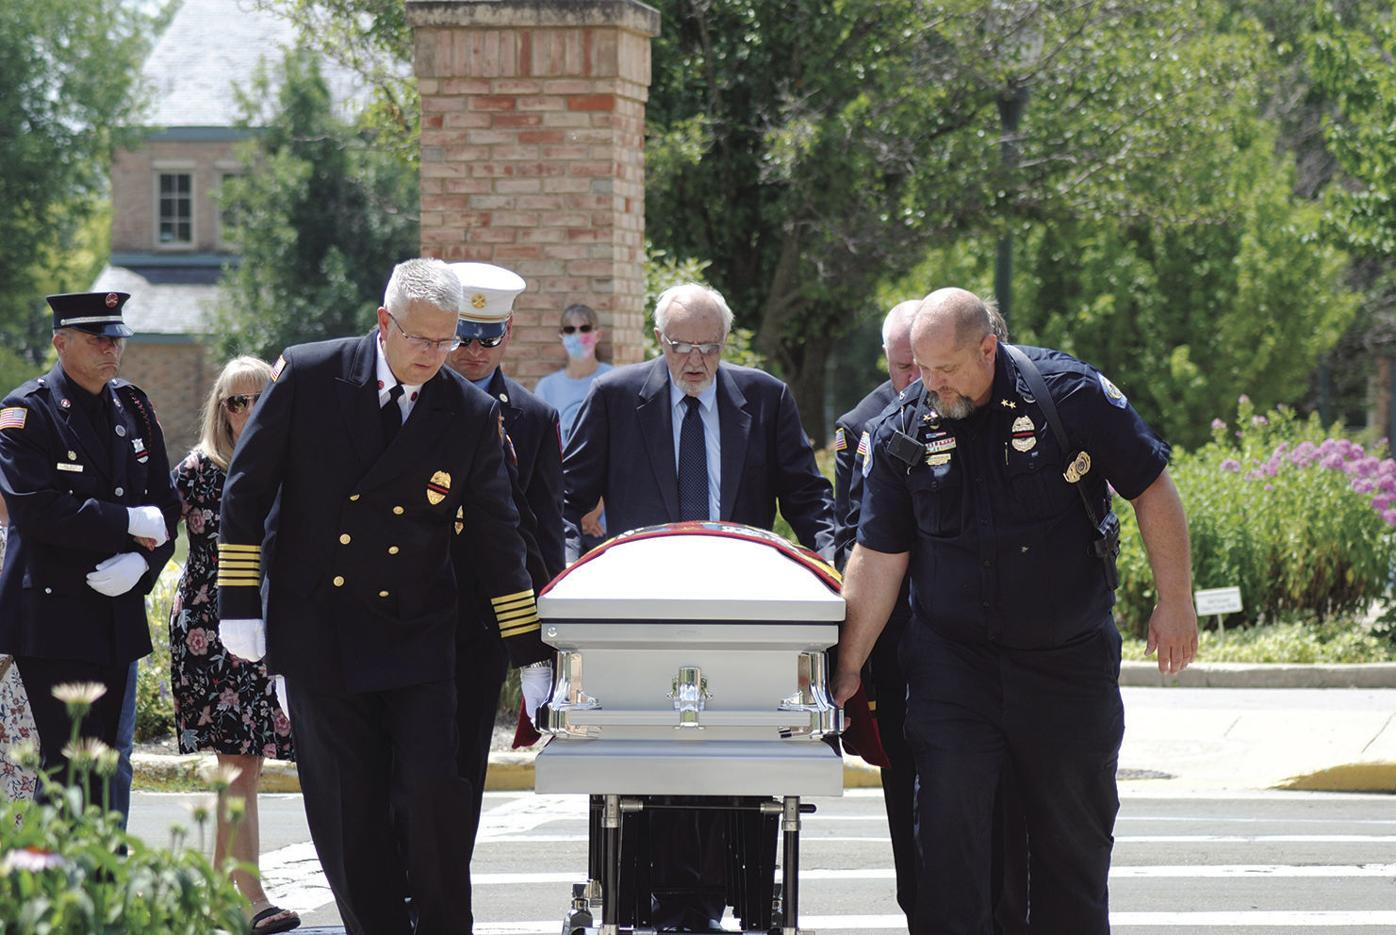 Capt. Mark Bentheimer's funeral